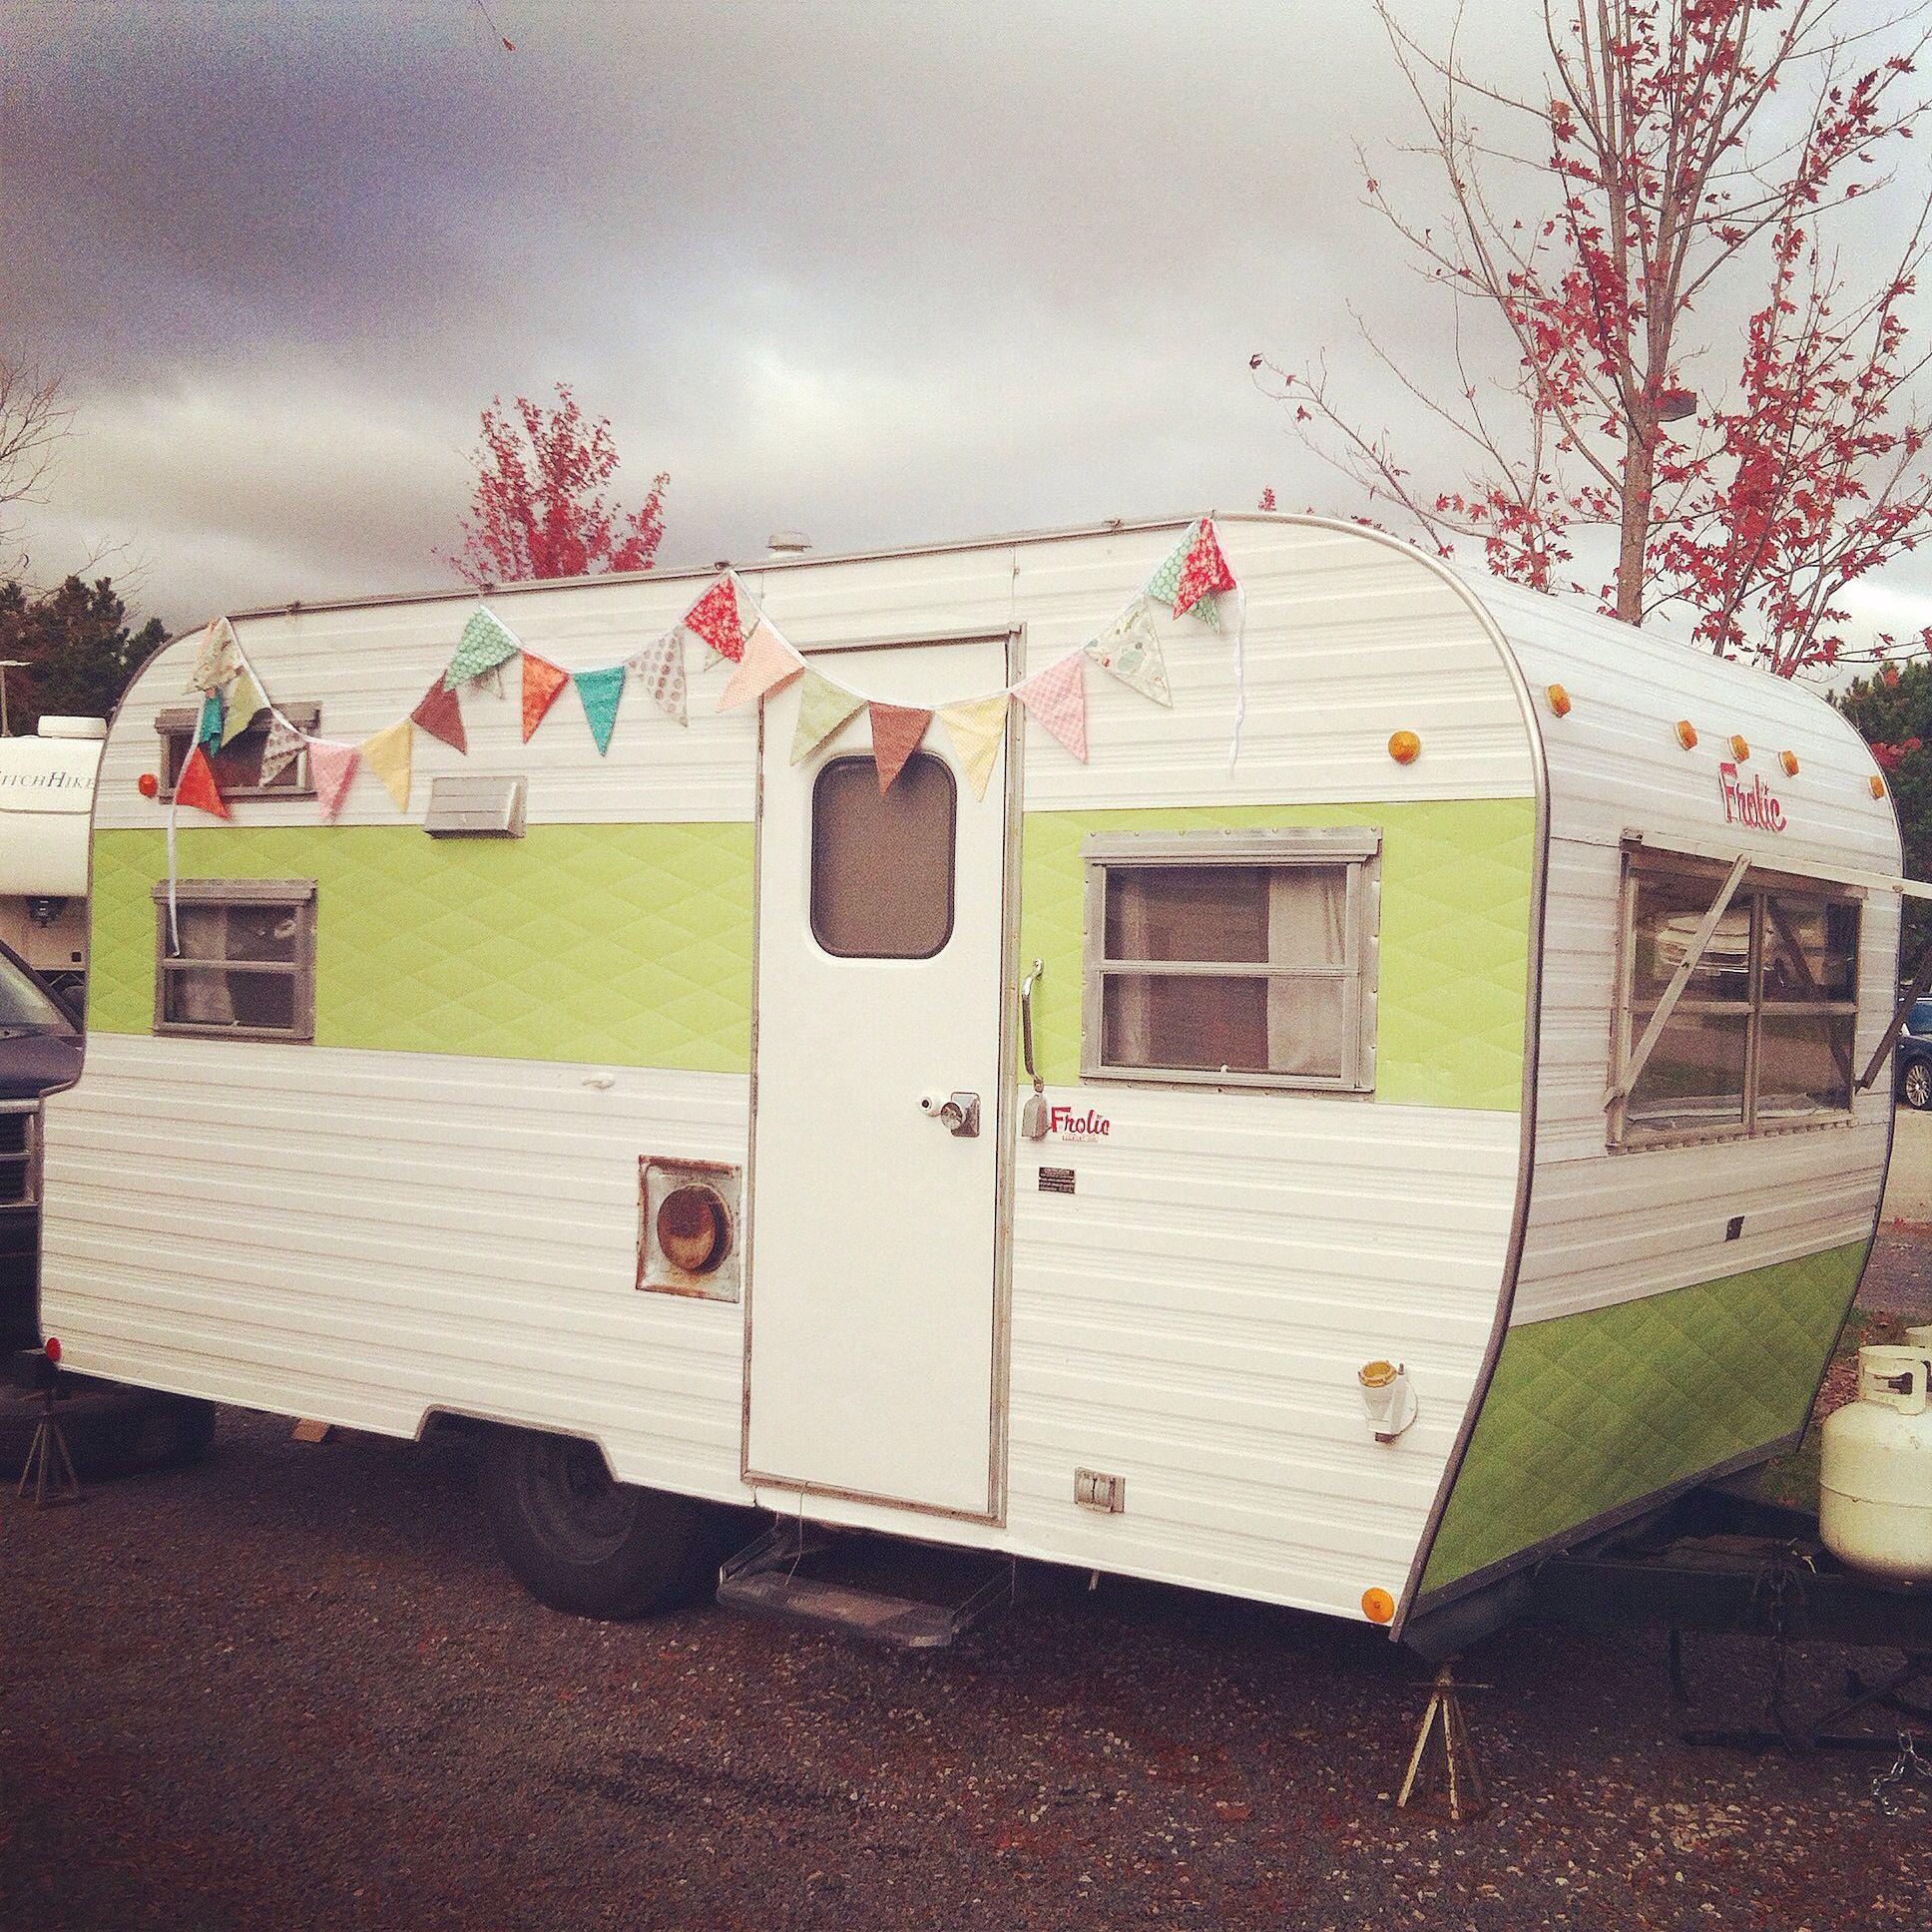 Travel Trailers Under 1500 Lbs: 1967 Frolic Vintage Camper